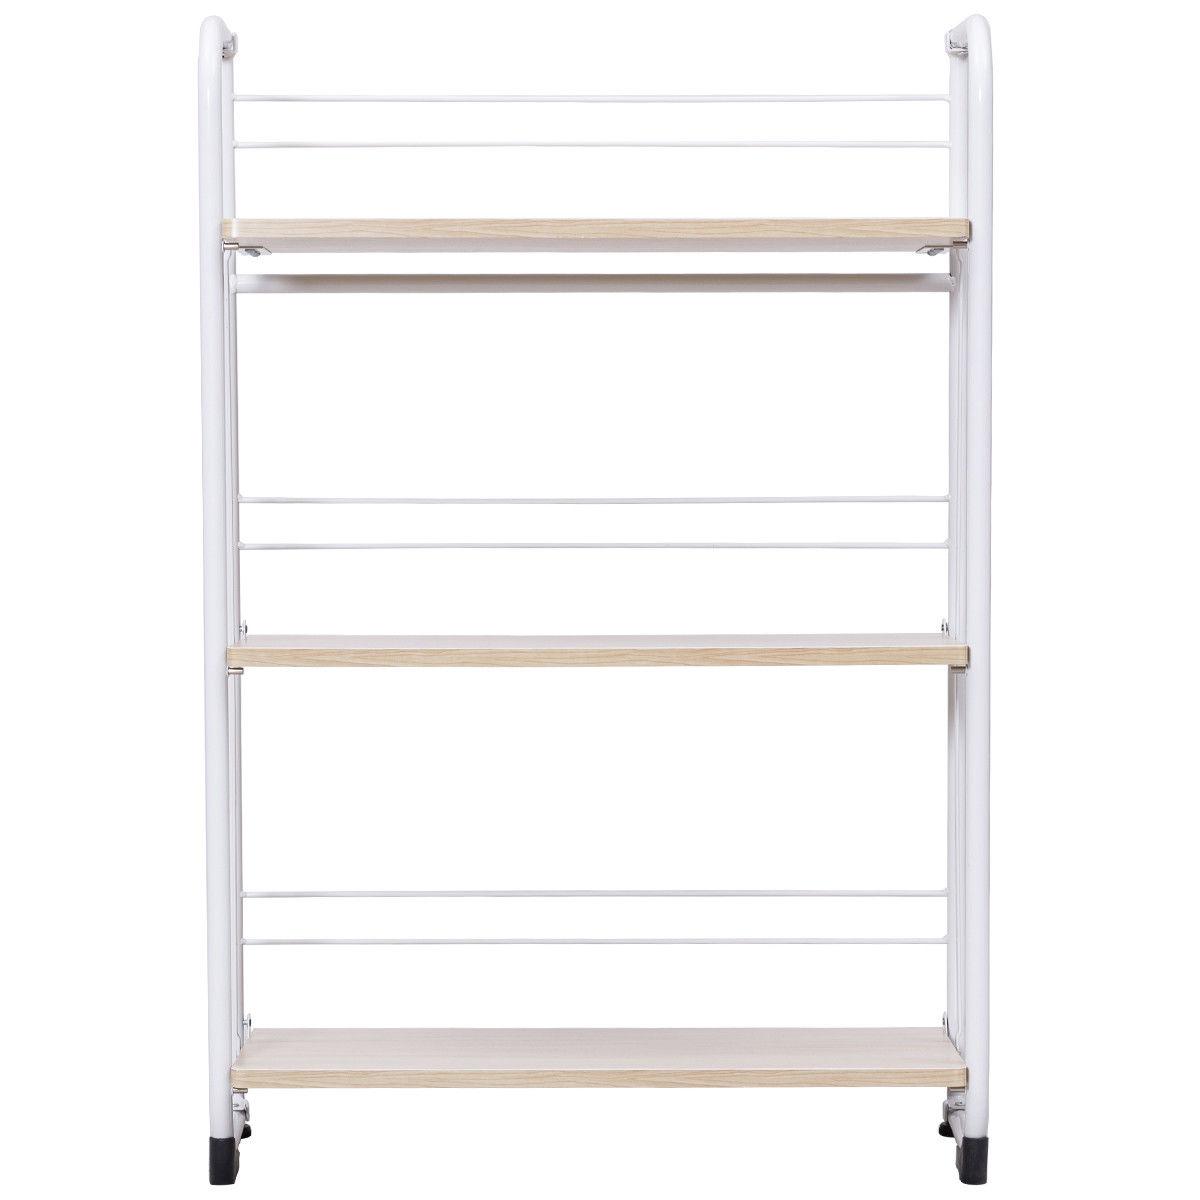 Gymax Folding 3 Tier Shelves Organization Storage Utility Shelving Unit Standing Rack - image 3 of 10